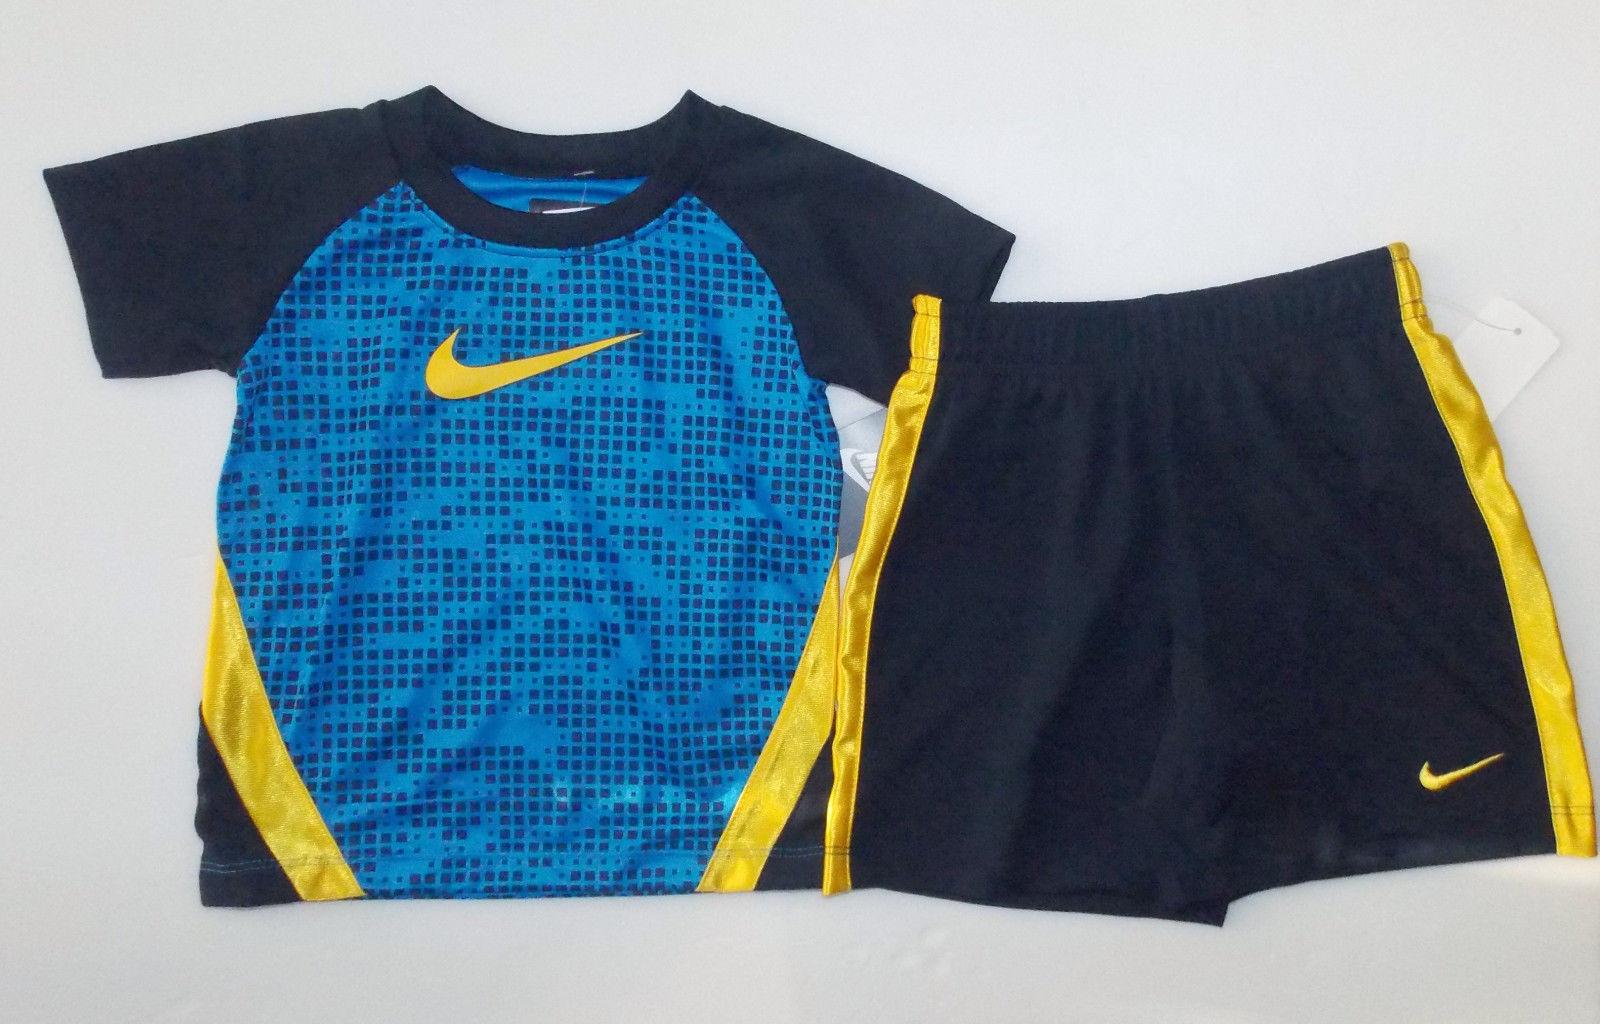 5004025e5ddd Nike Infant Boys T-Shirt   Shorts Set Blue Yellow Black Sizes 18M   24M NWT